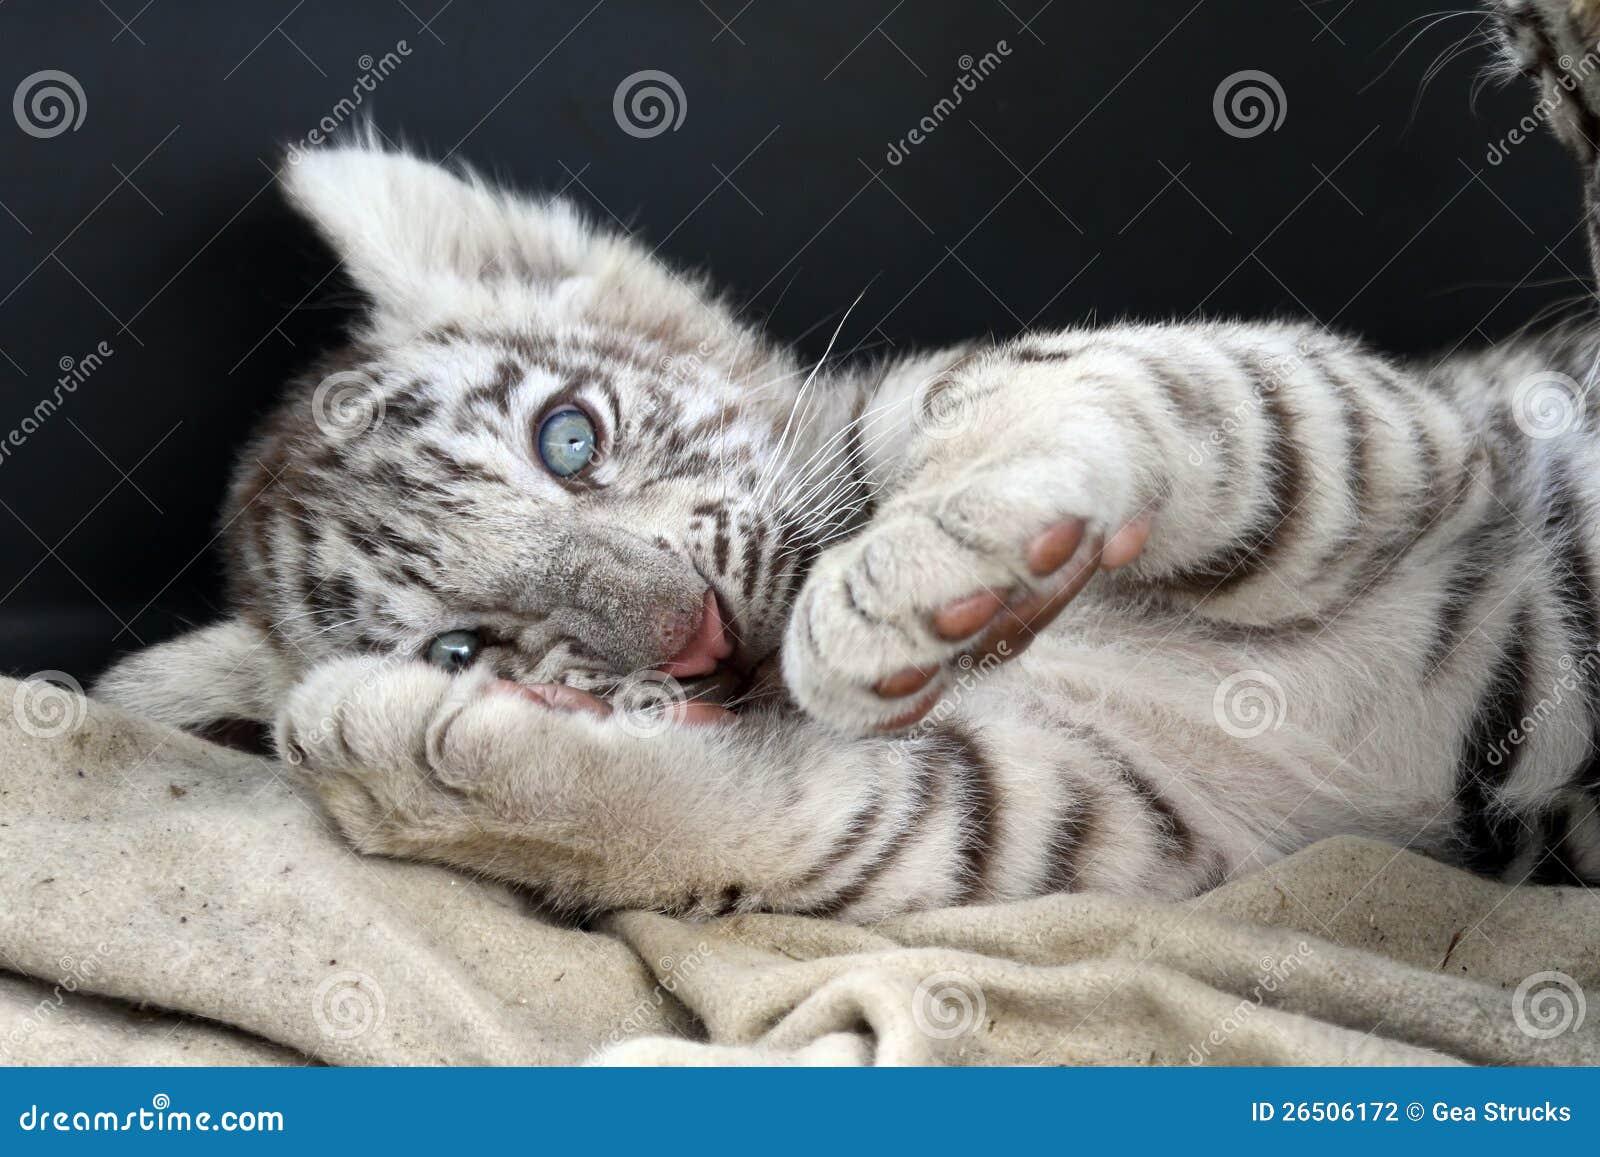 Tigre De Bengala Blanco Bebe | www.pixshark.com - Images ...